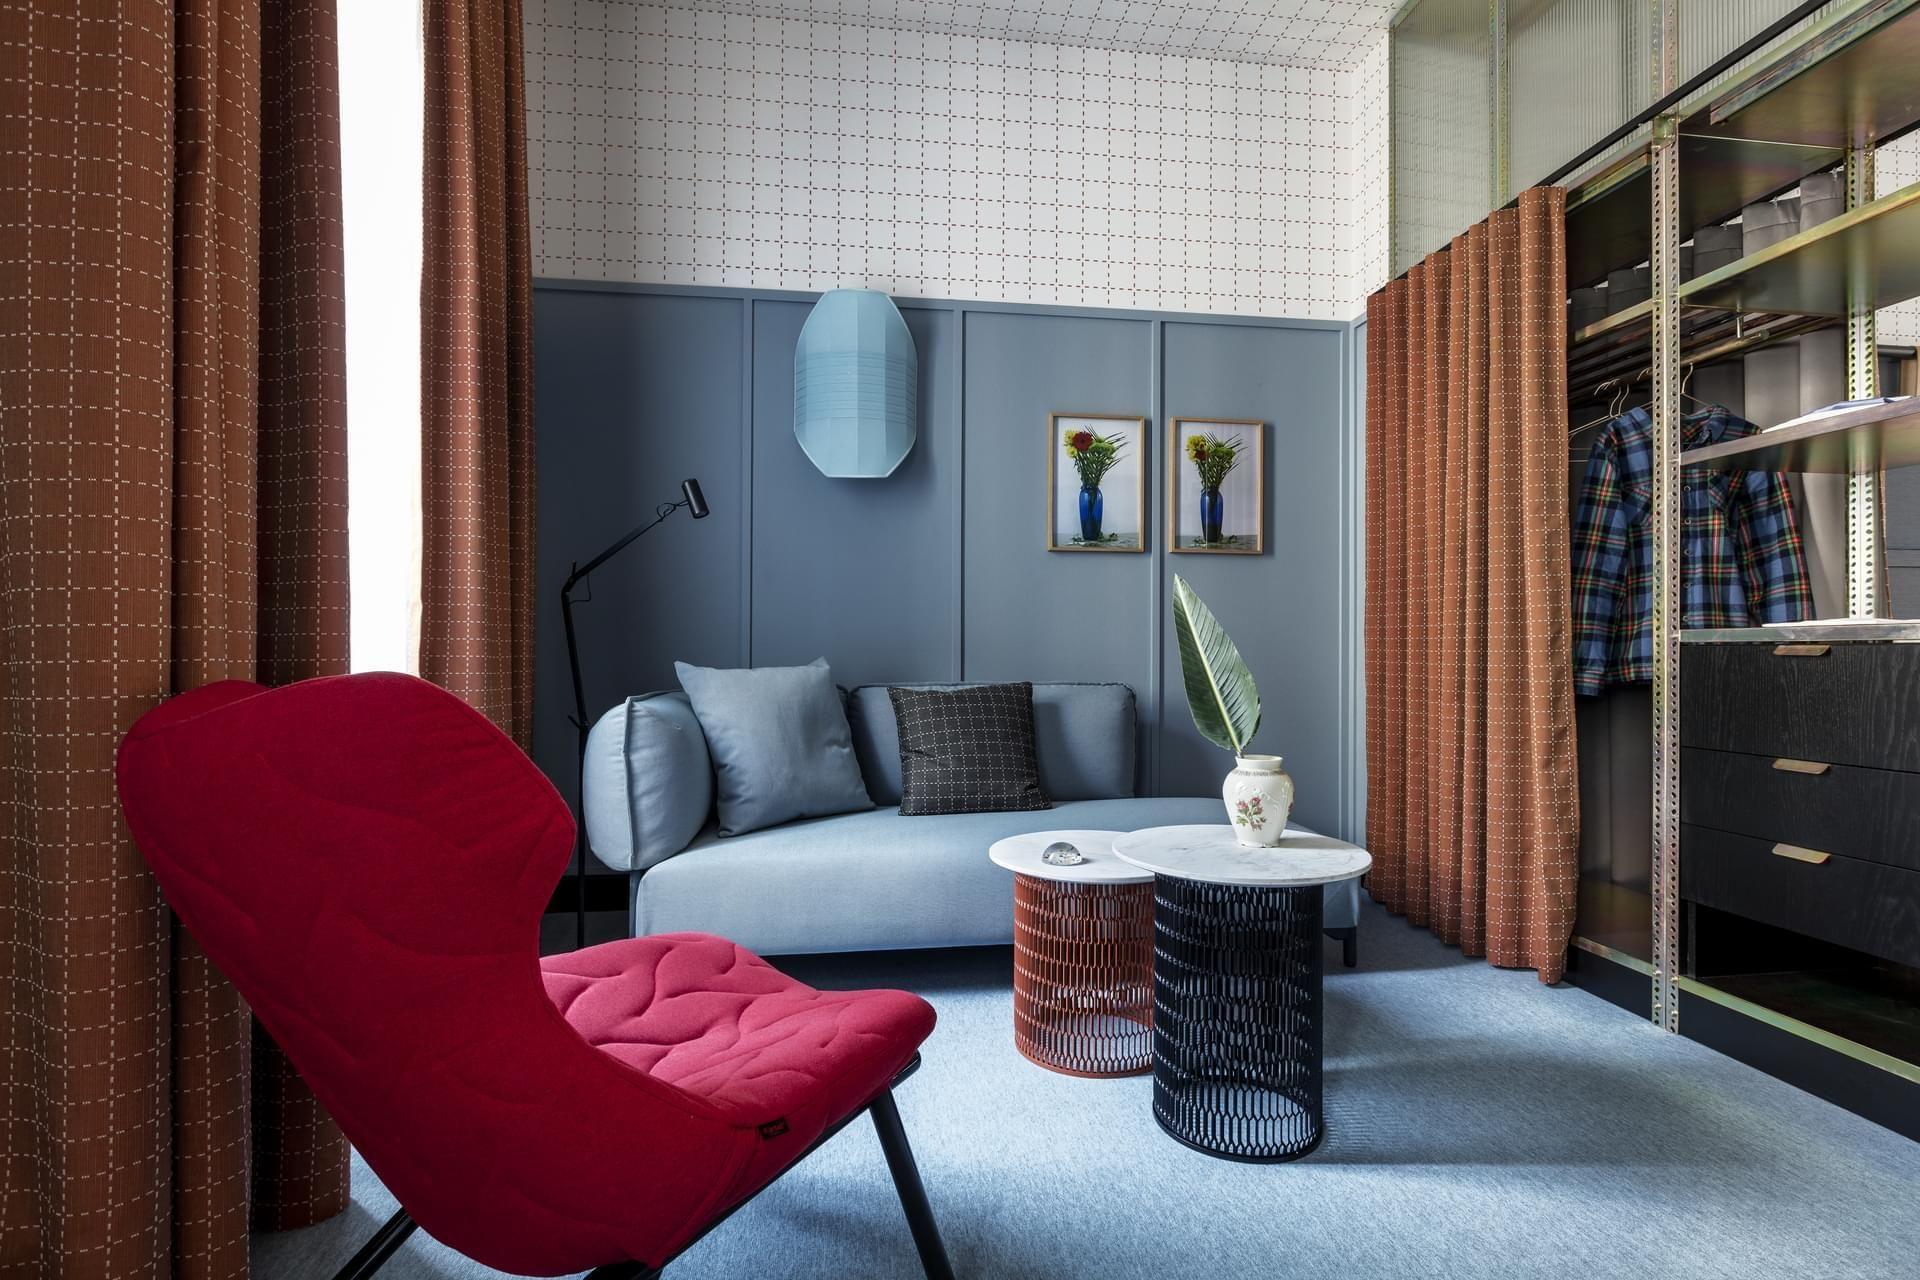 Luxury Hotel Room Kitchens